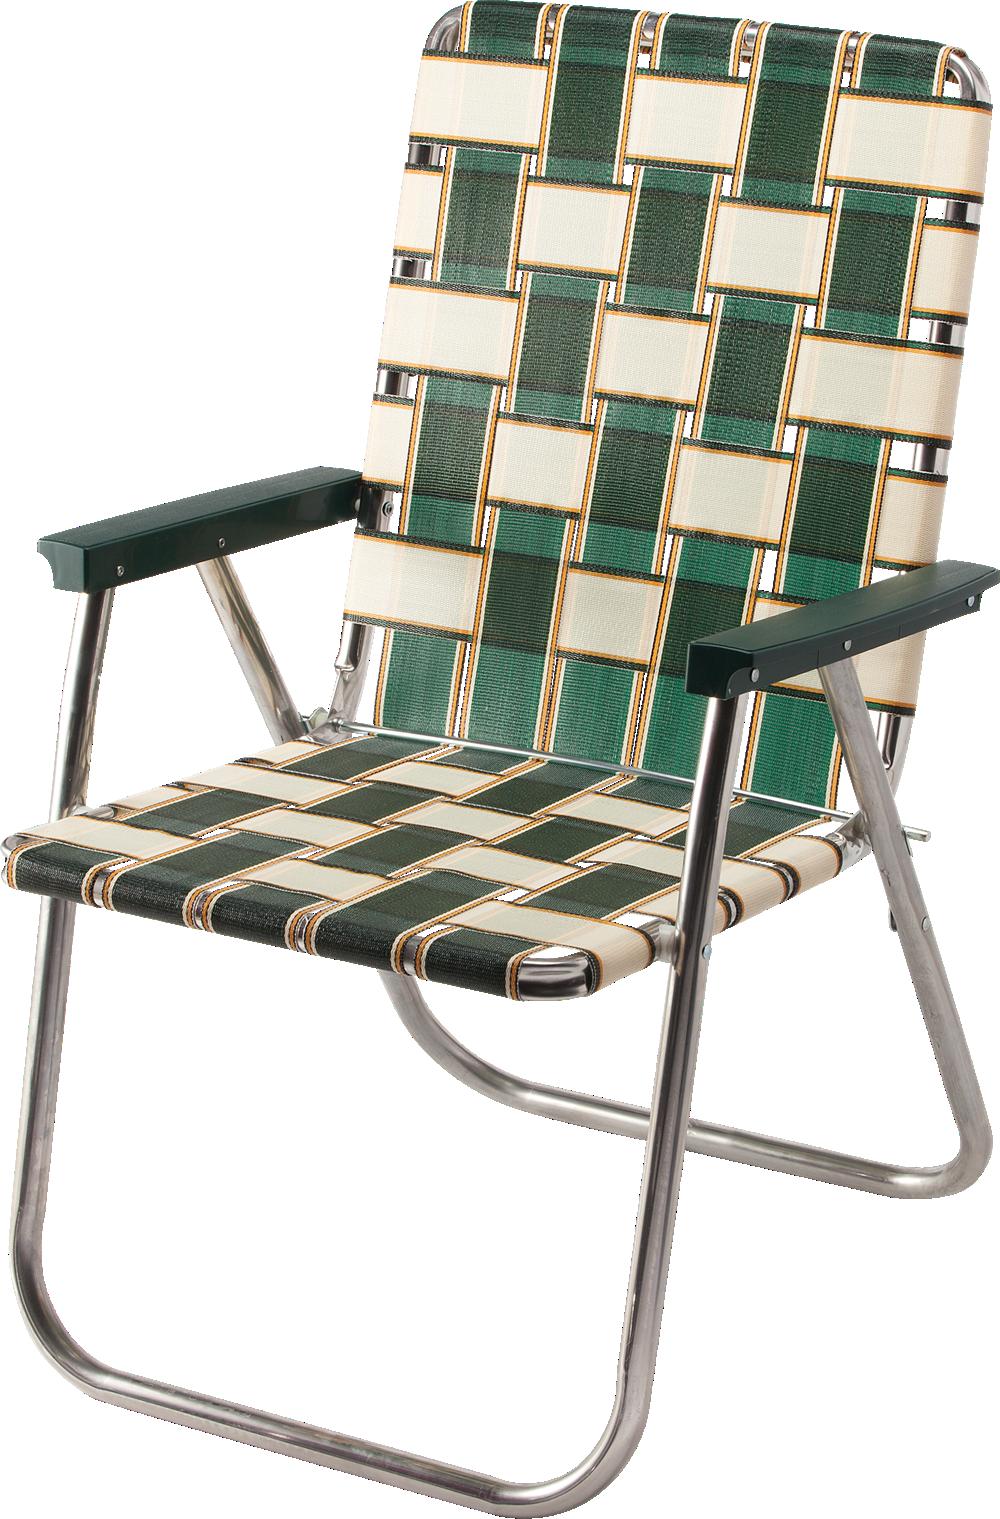 Pin By Waialea On Peach Lake Lawn Chairs Summer Chairs Chair